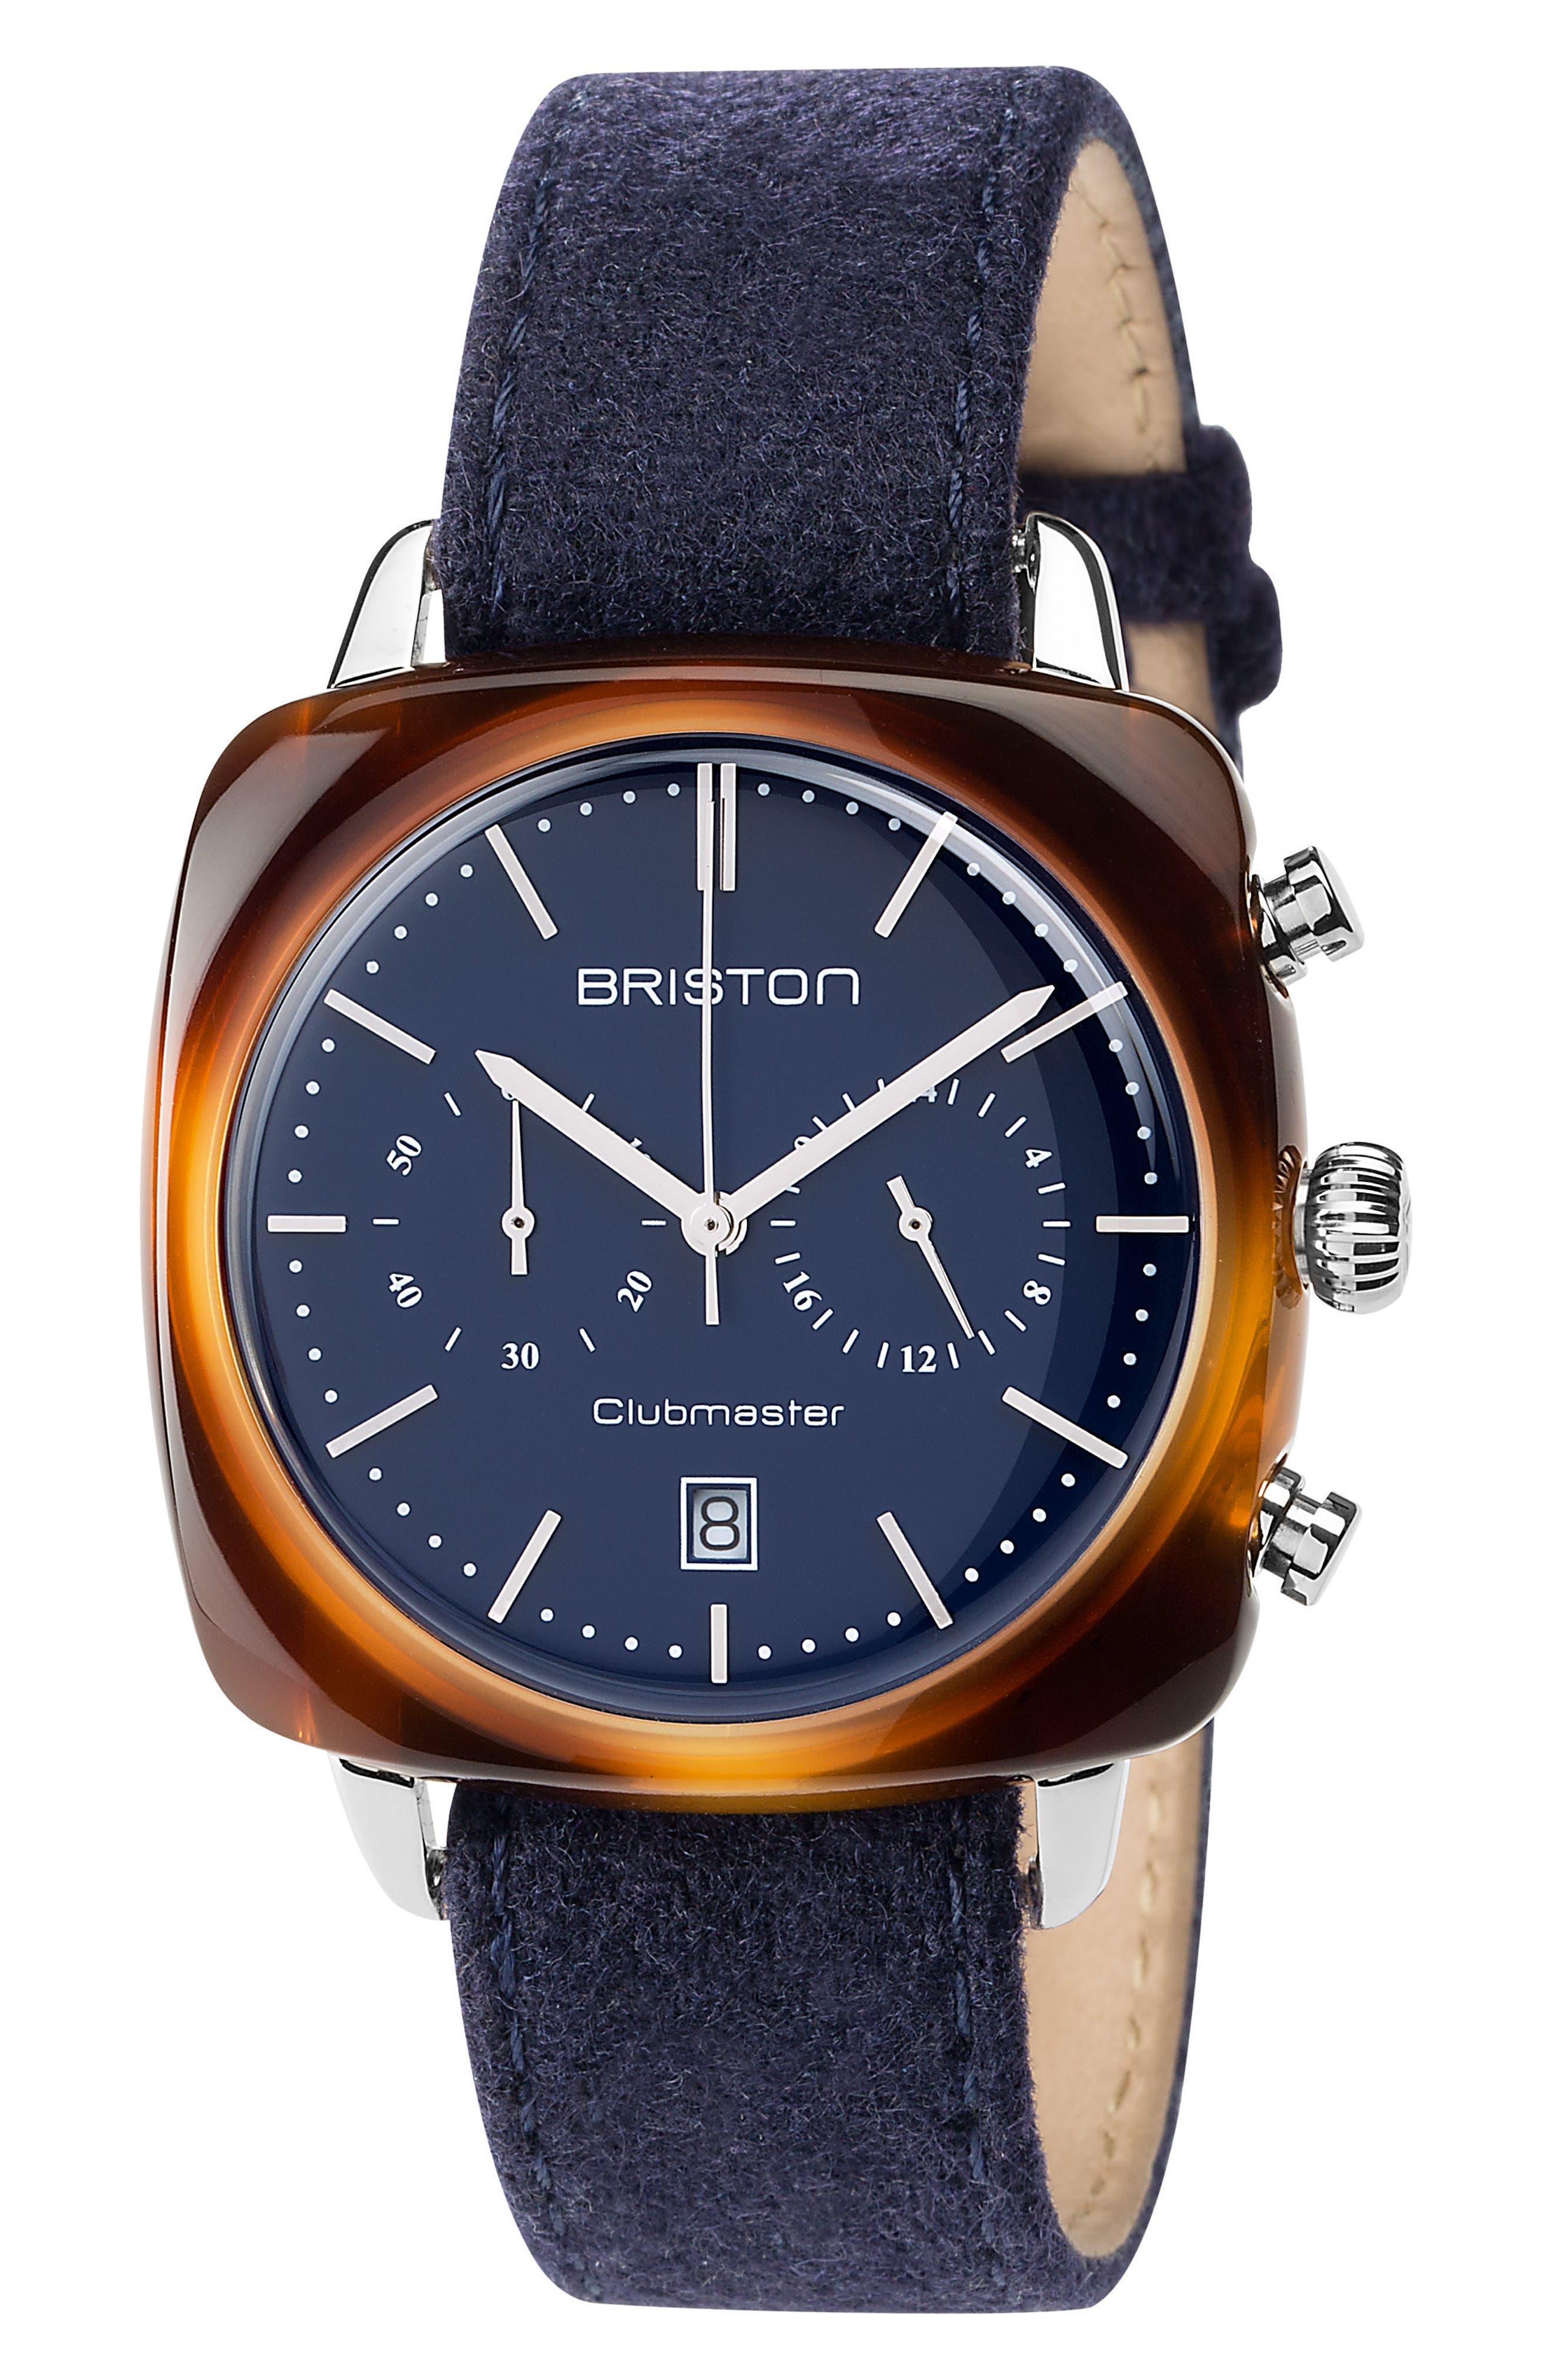 Main Image - Briston Watches Clubmaster Vintage Chronograph Nylon Strap Watch, 40mm x 40mm